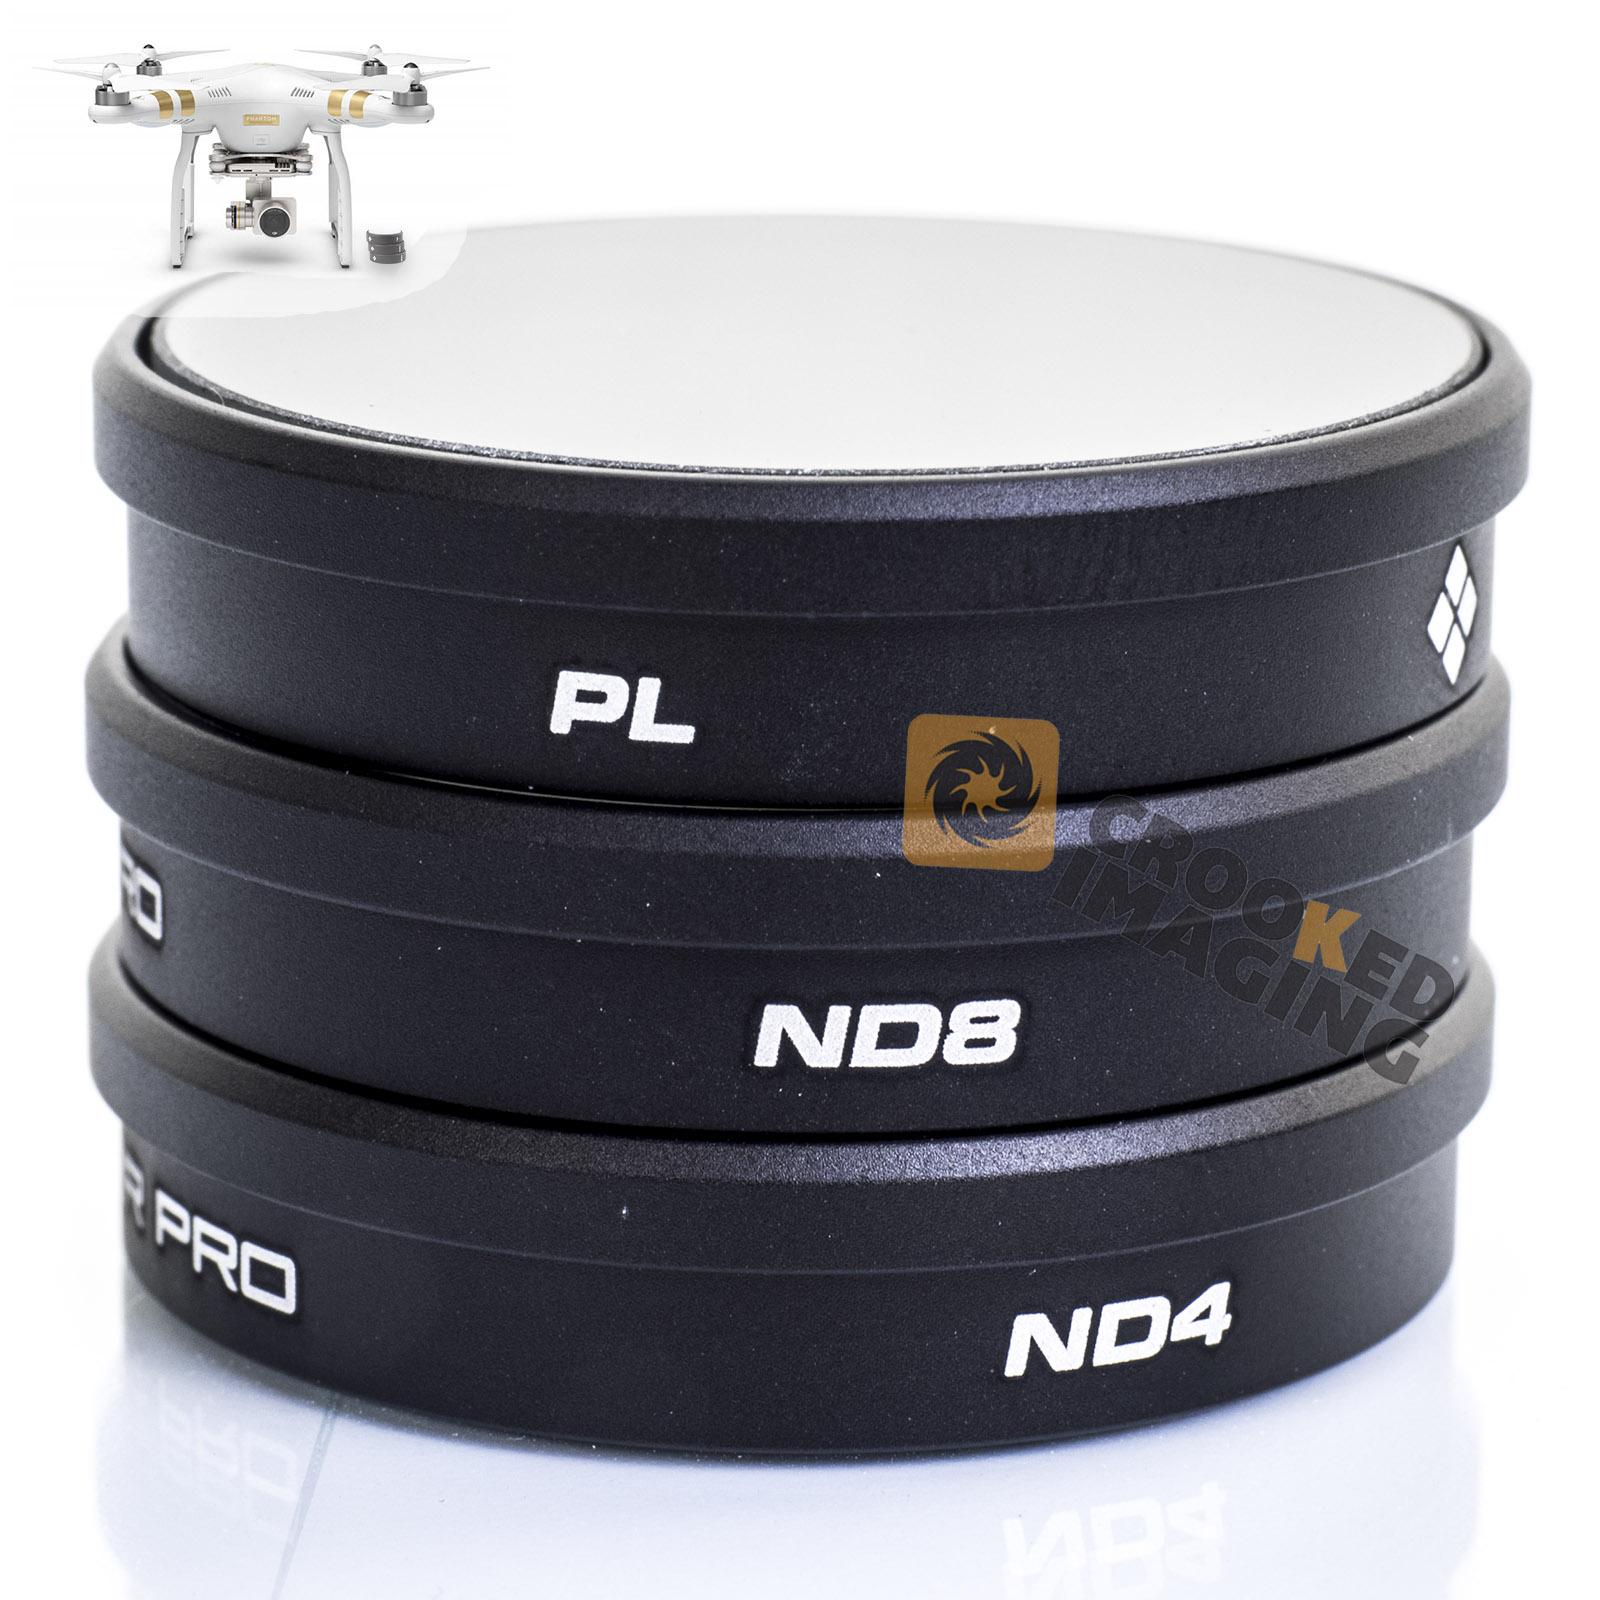 Drone Filter Mavic 2 Pro NDPL4/8/16/32 Neutral Density Polar Advanced Set Mavic2 Pro Accessories